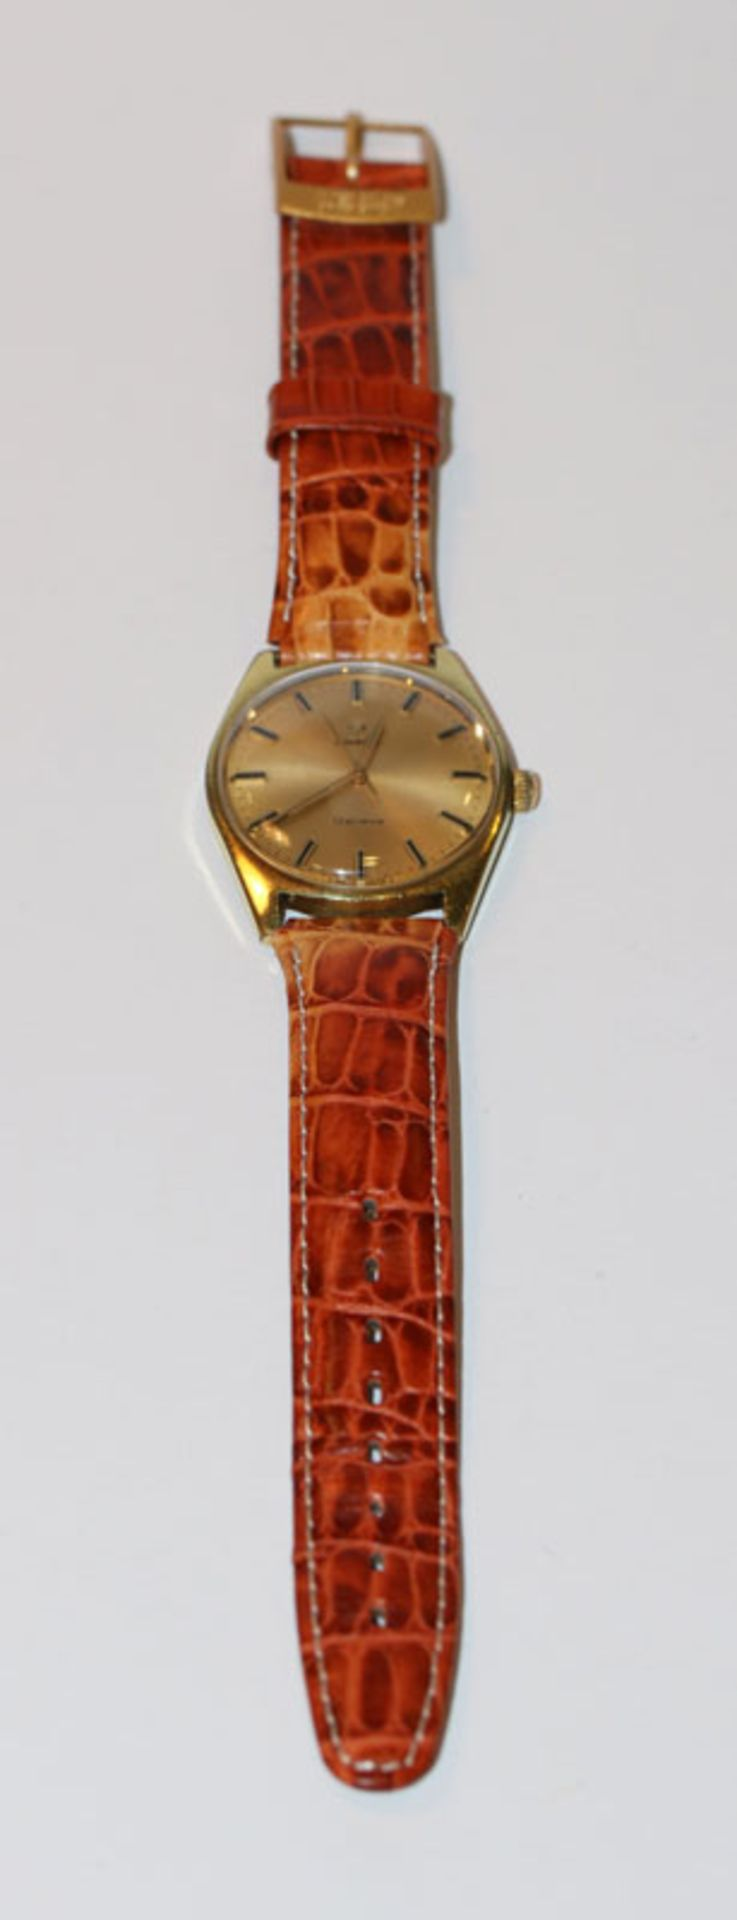 Omega Armbanduhr, vergoldet, mechanisches Werk, intakt, an braunem Lederarband, Tragespuren